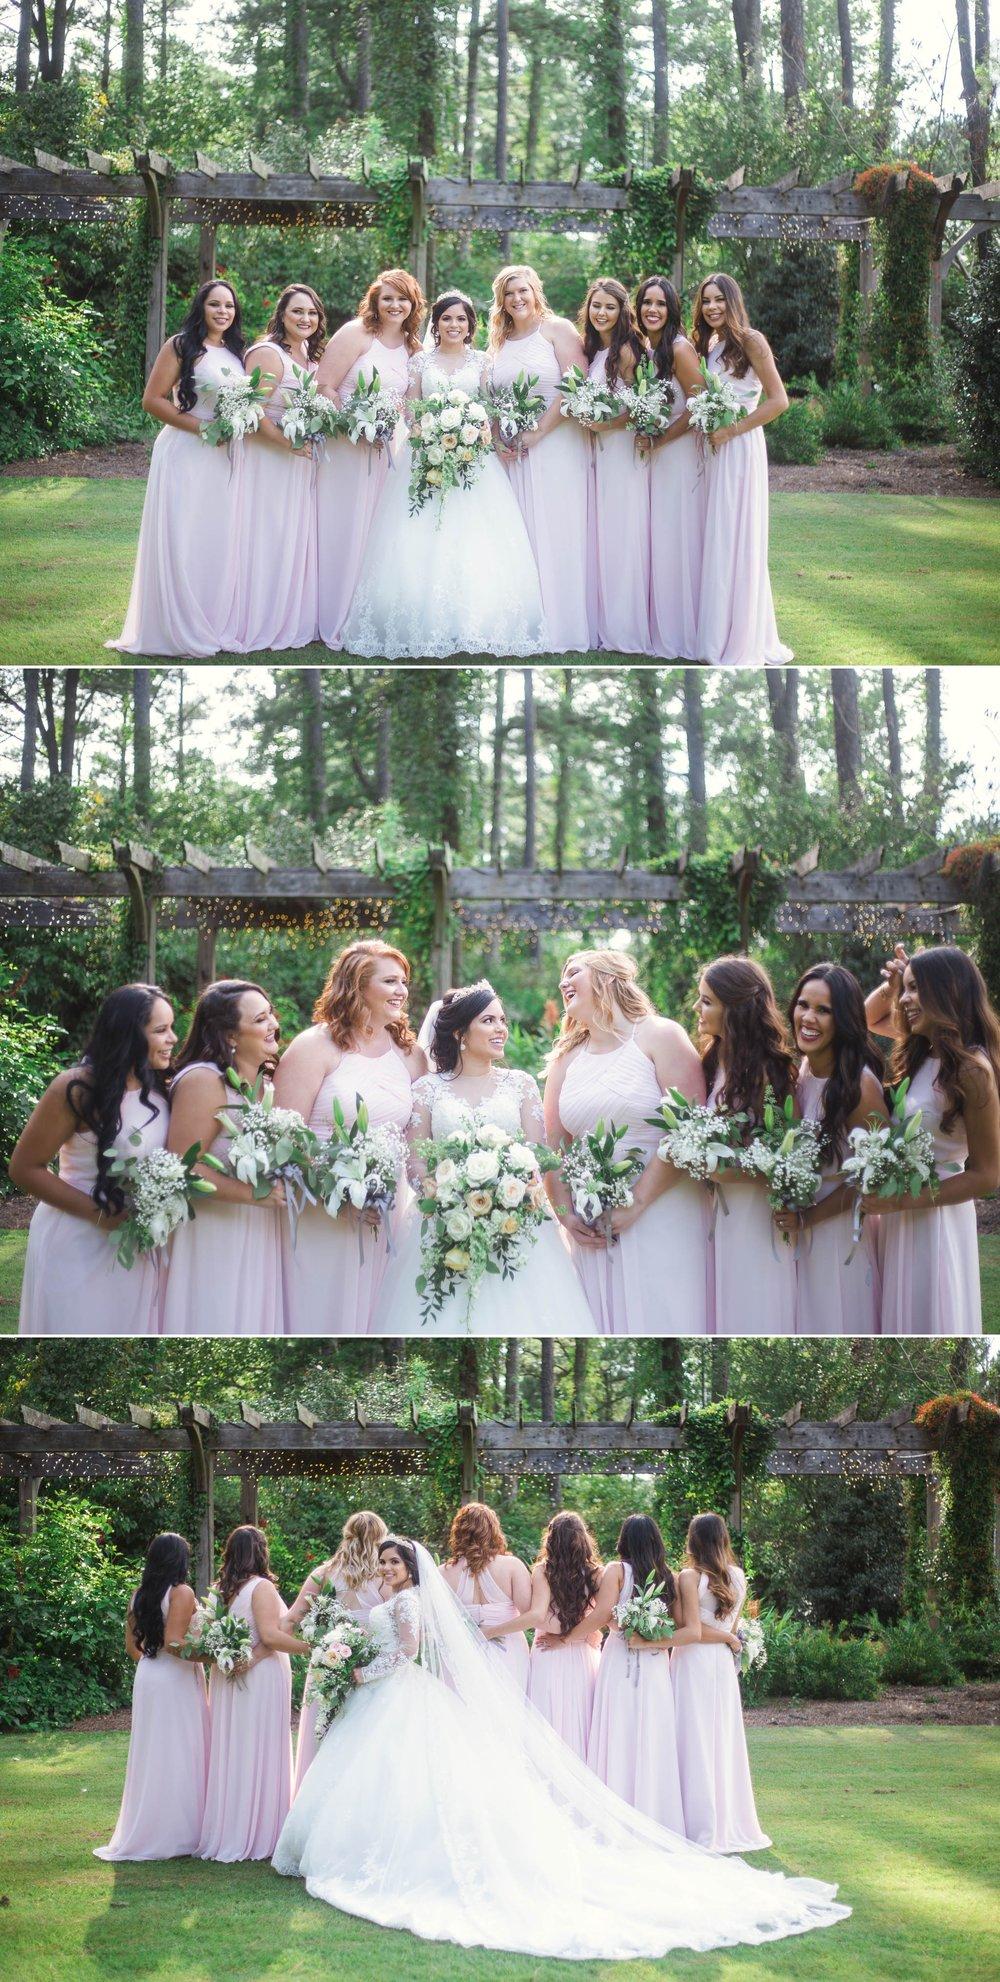 Bridesmaids Portraits - Yansi + Eddie - Wedding at Cape Fear Botanical Garden - Fayetteville North Carolina Photographer